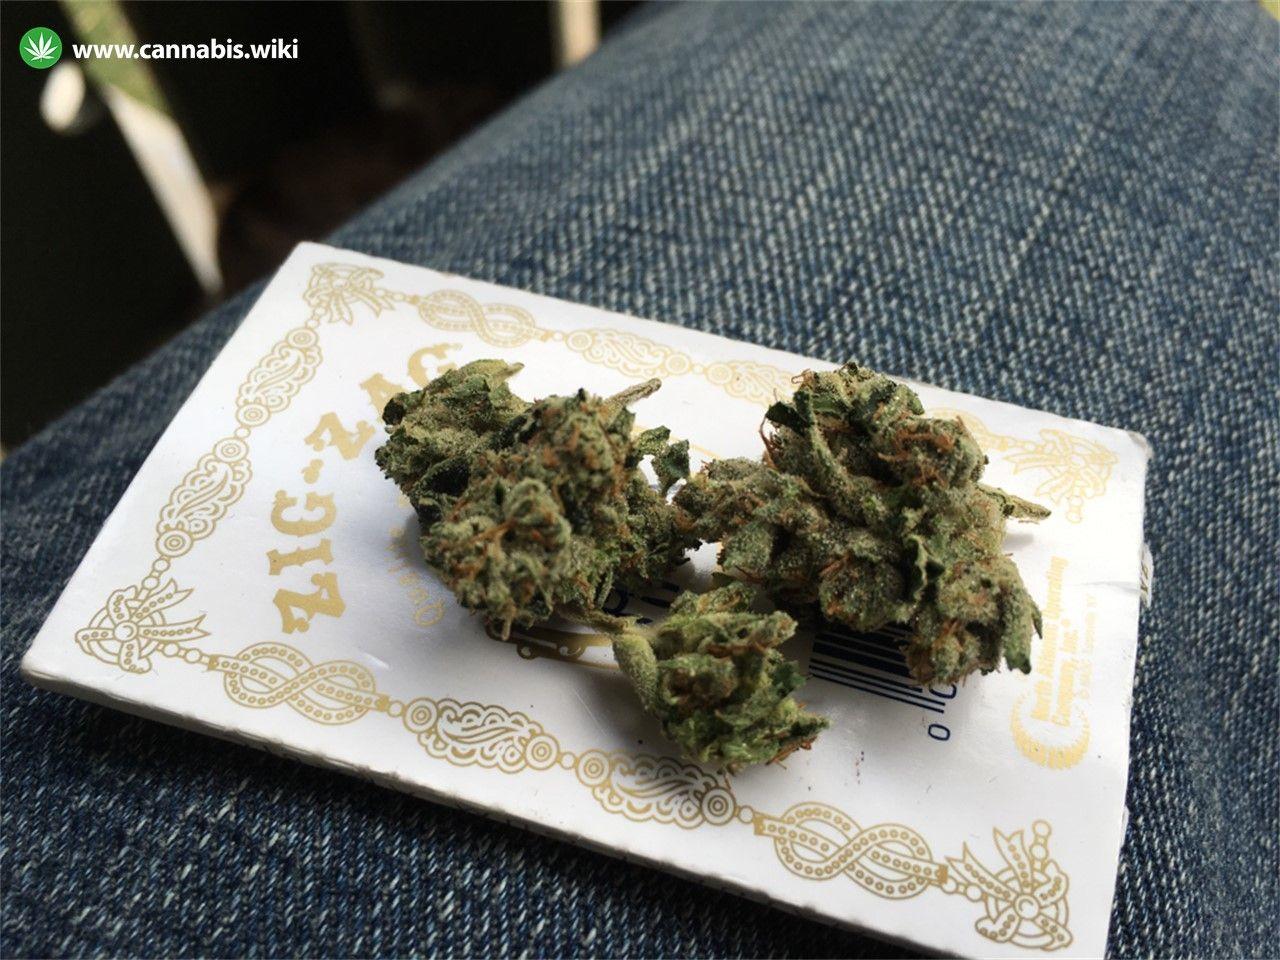 Cannabis Wiki - Strain Mars OG - Mar - Indica